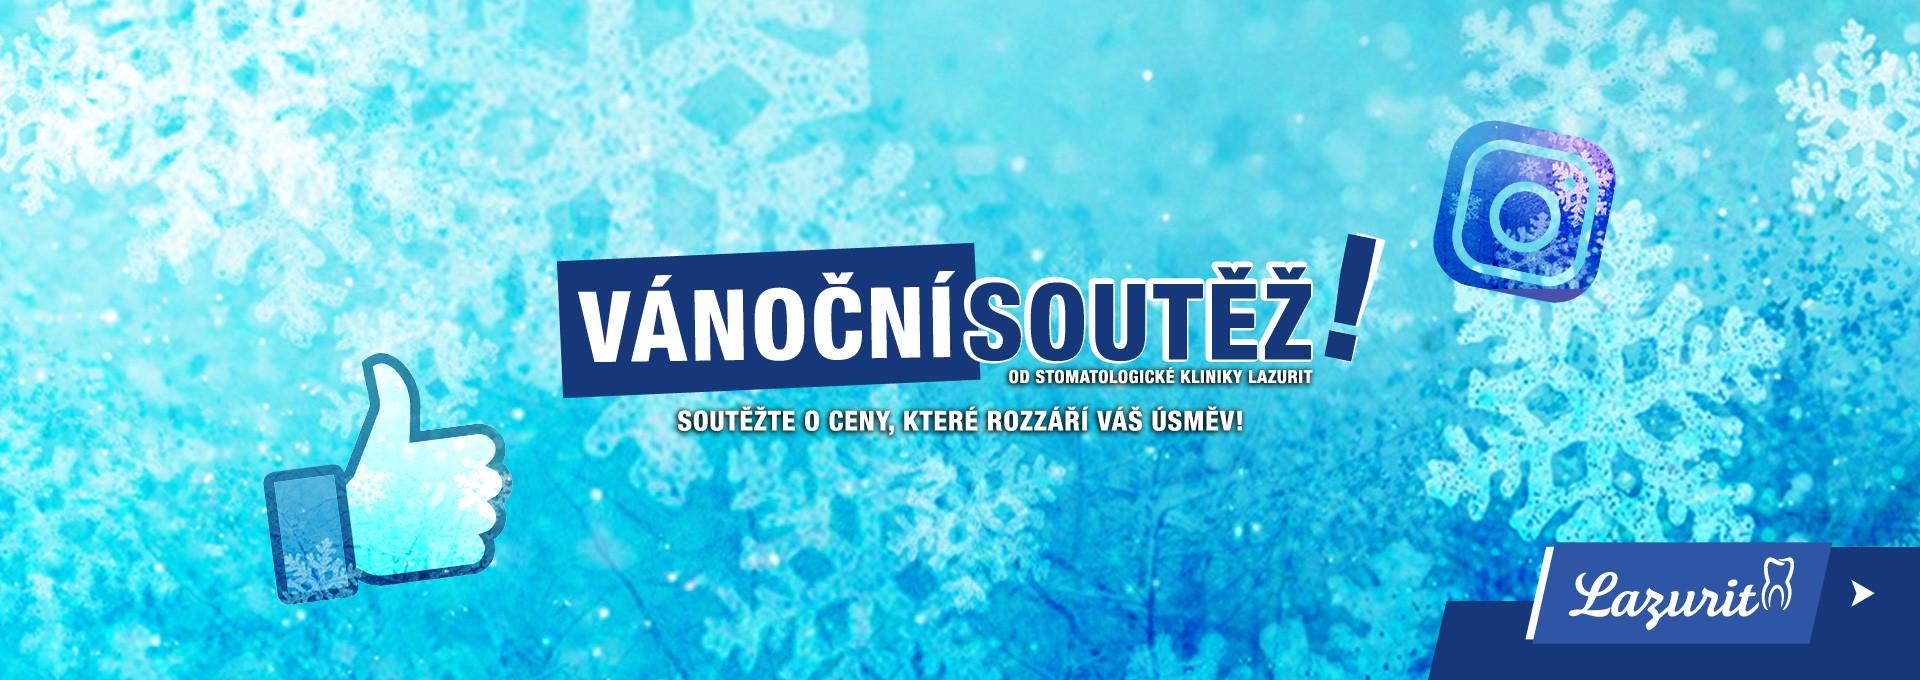 LAZURIT_2017-10-30_VanocniSoutez_web-1